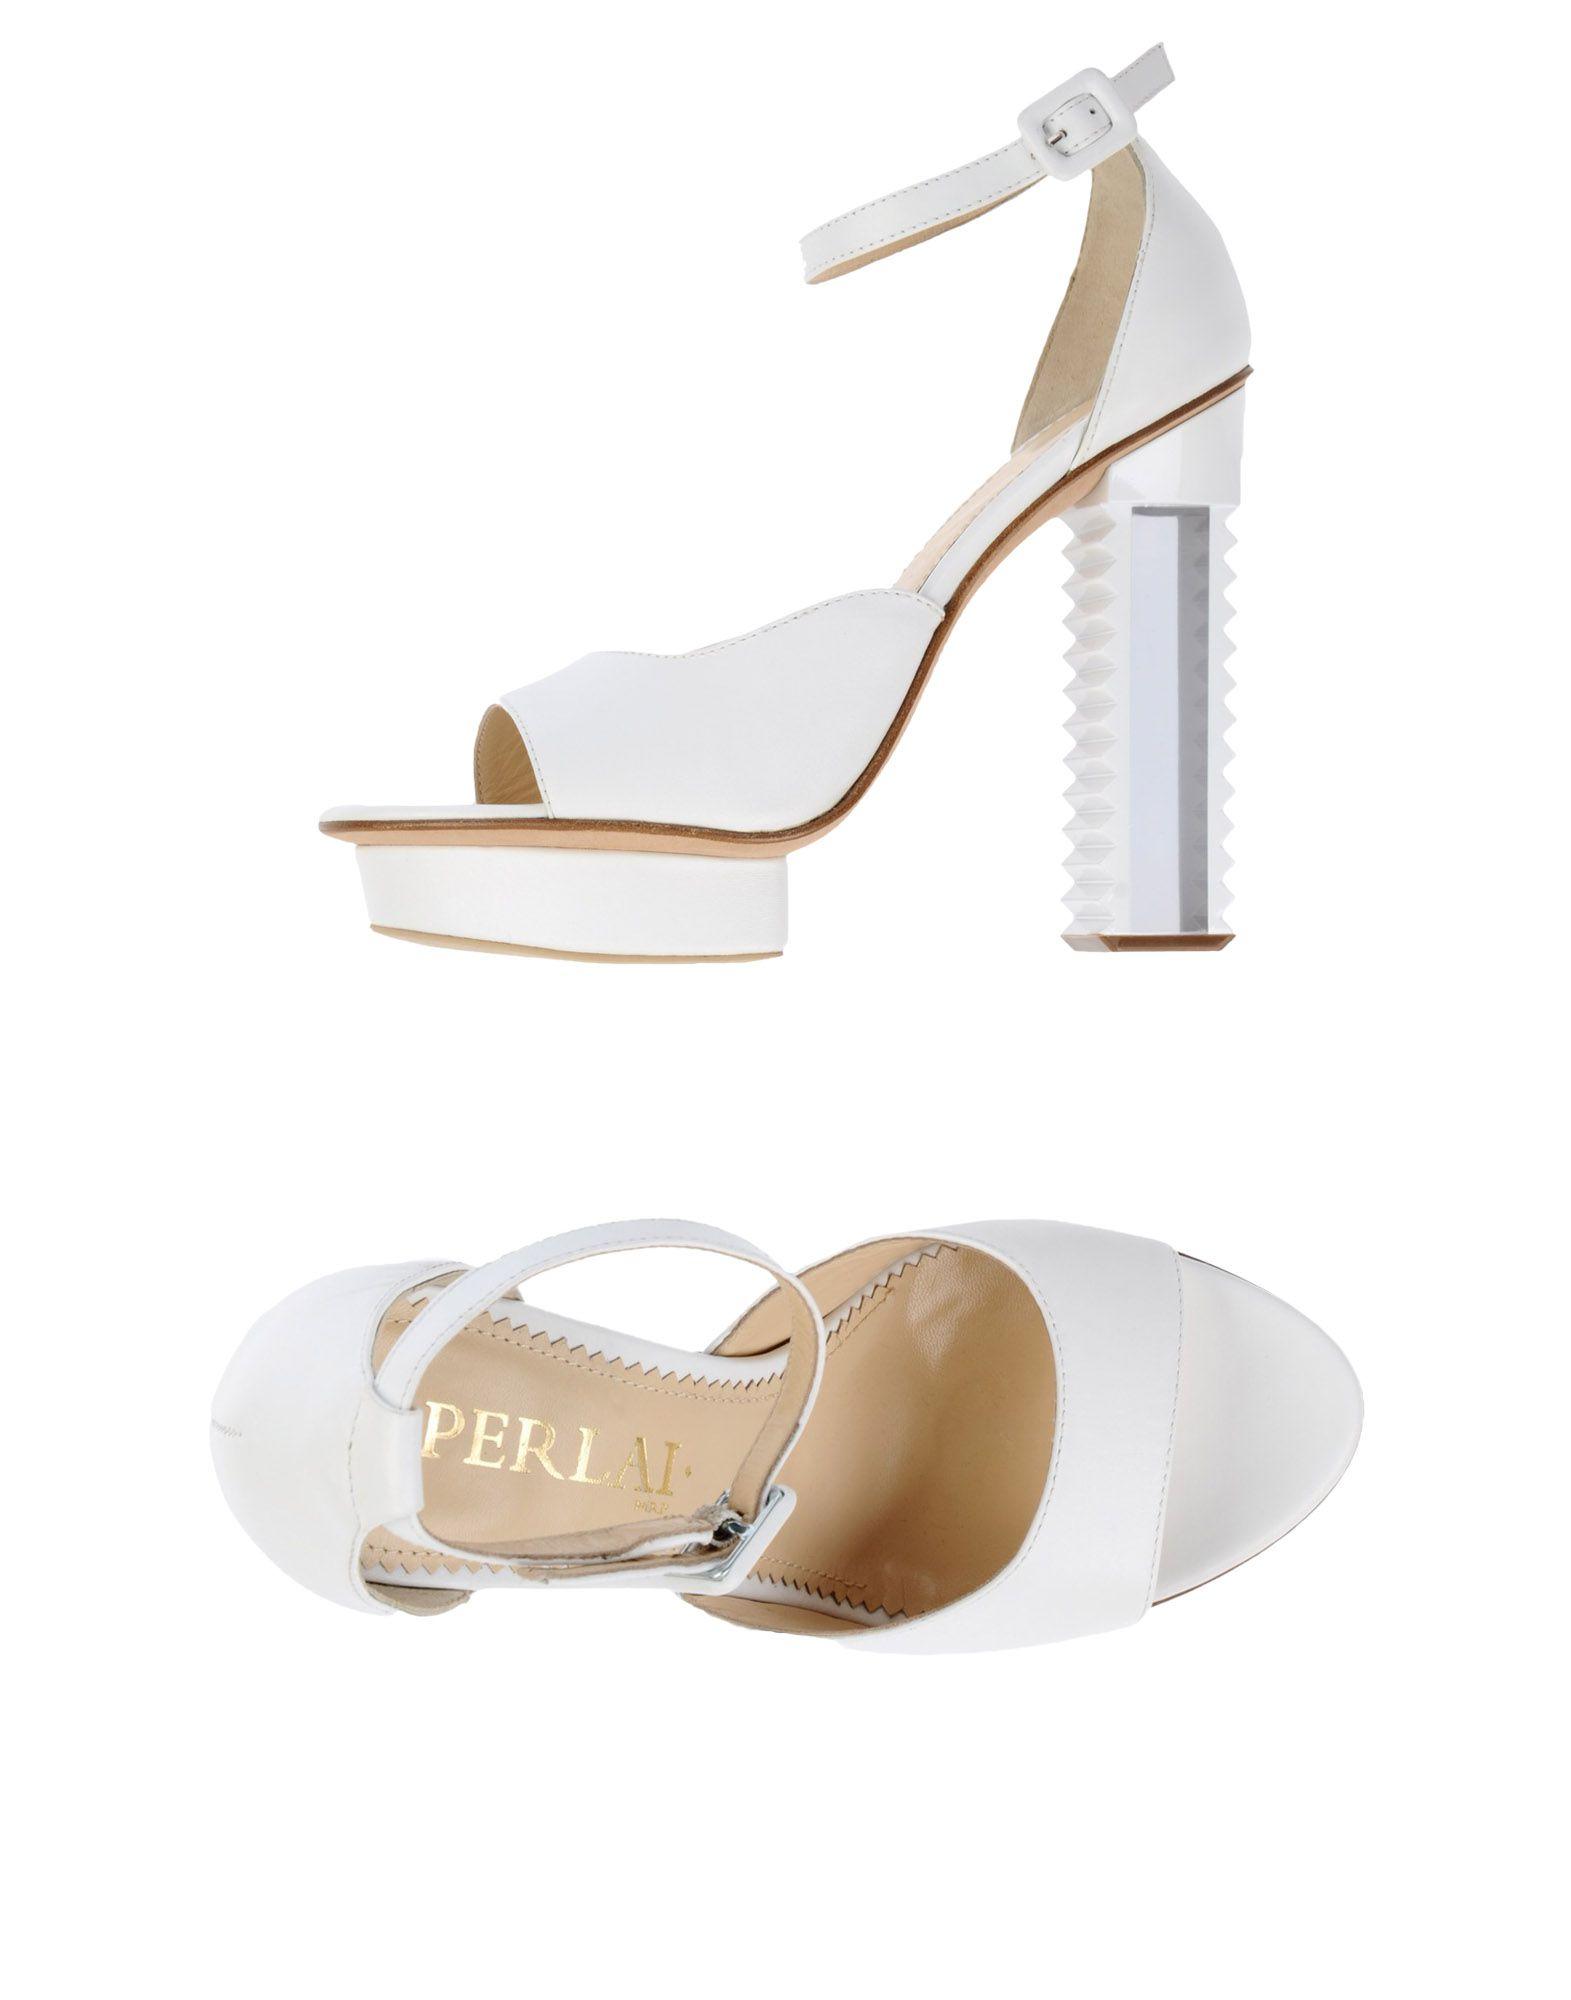 Aperlai White Shoes